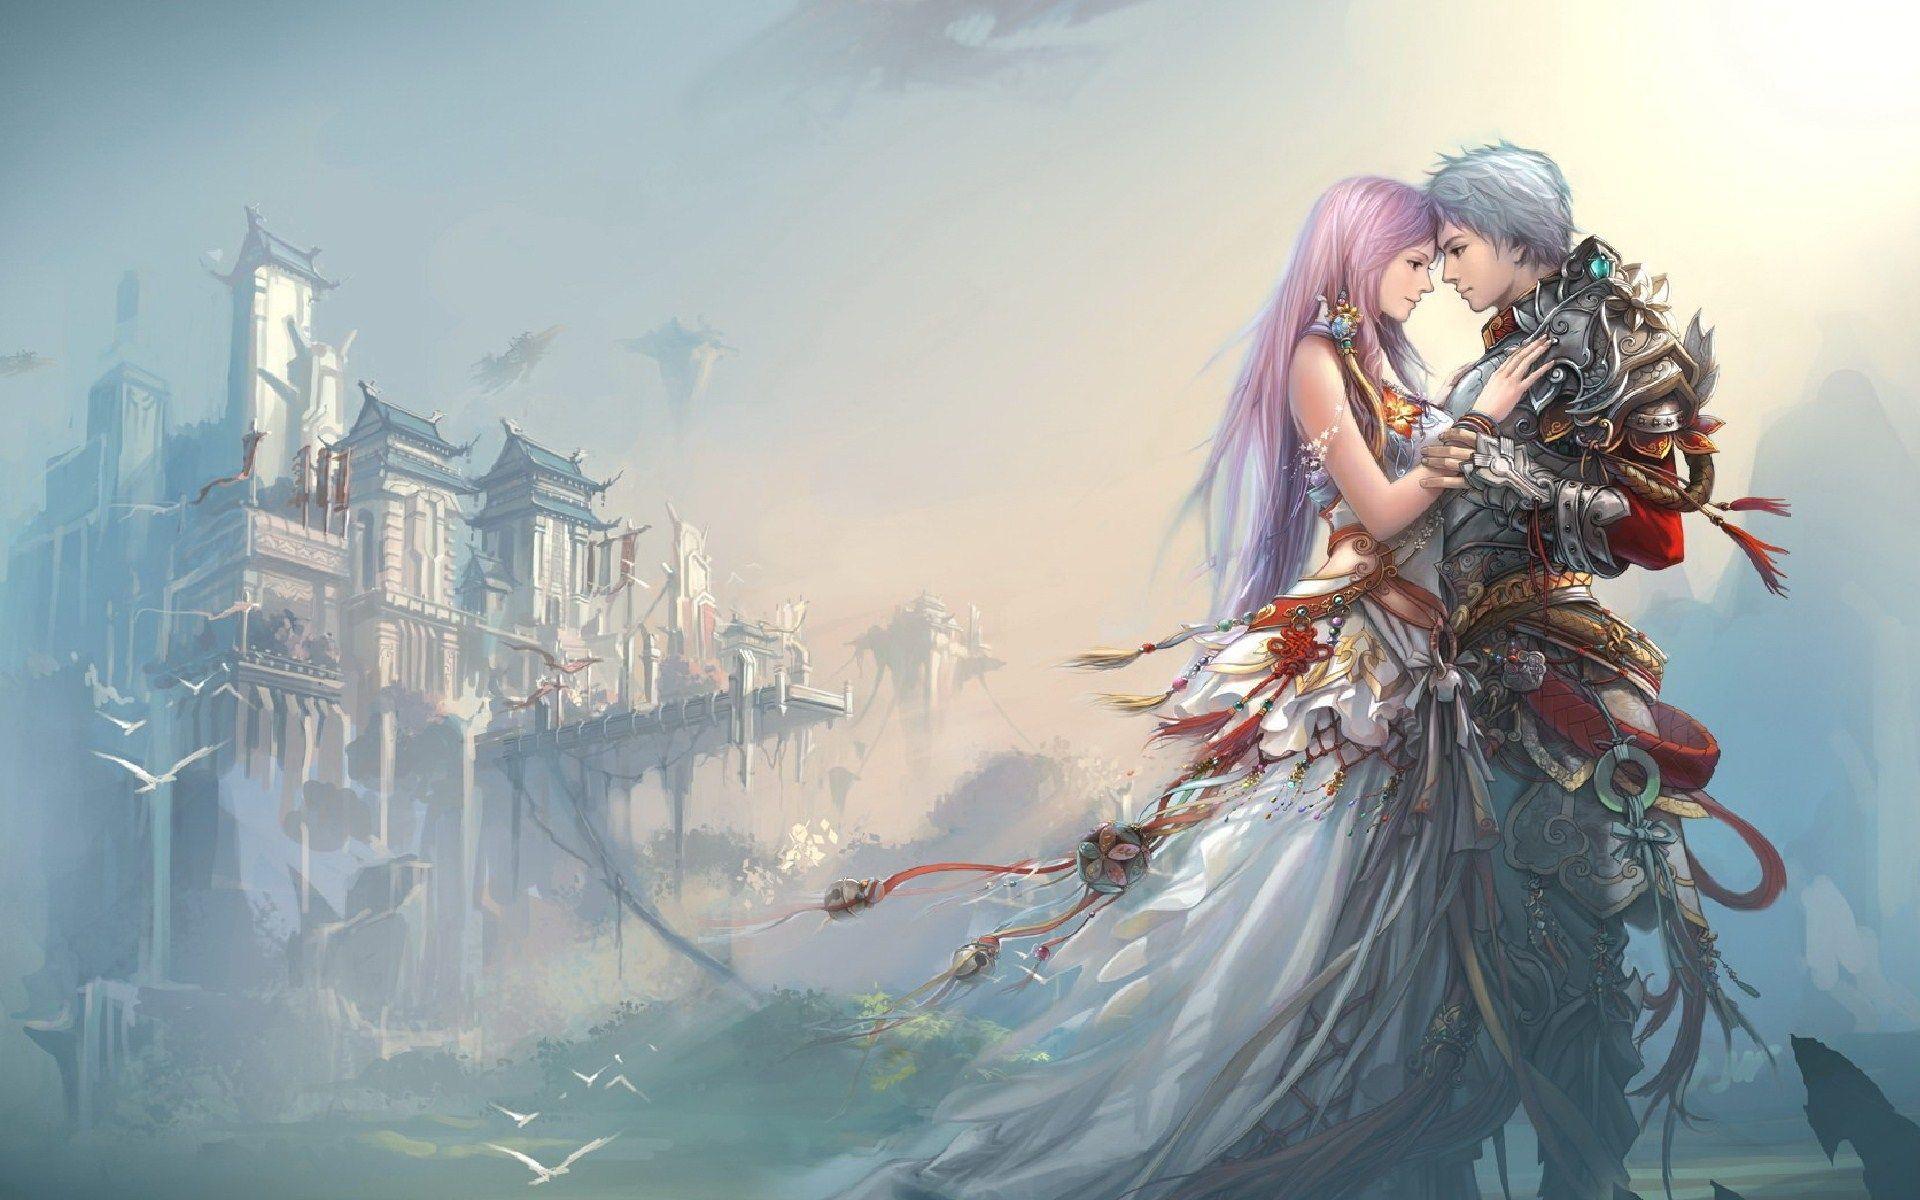 780 Koleksi Romantic Sad Couple Hd Wallpaper Terbaru